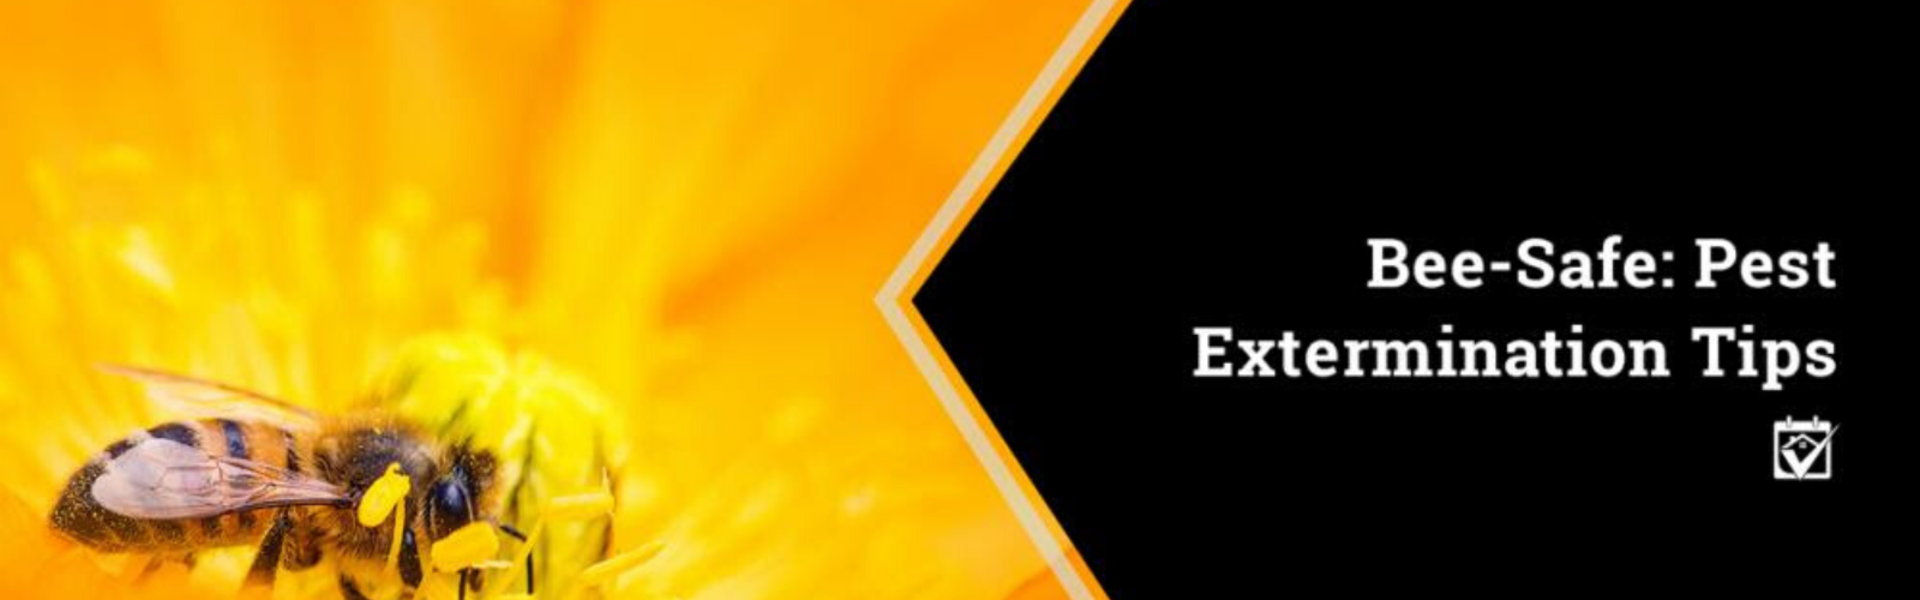 Bee-Safe: Pest Extermination Tips